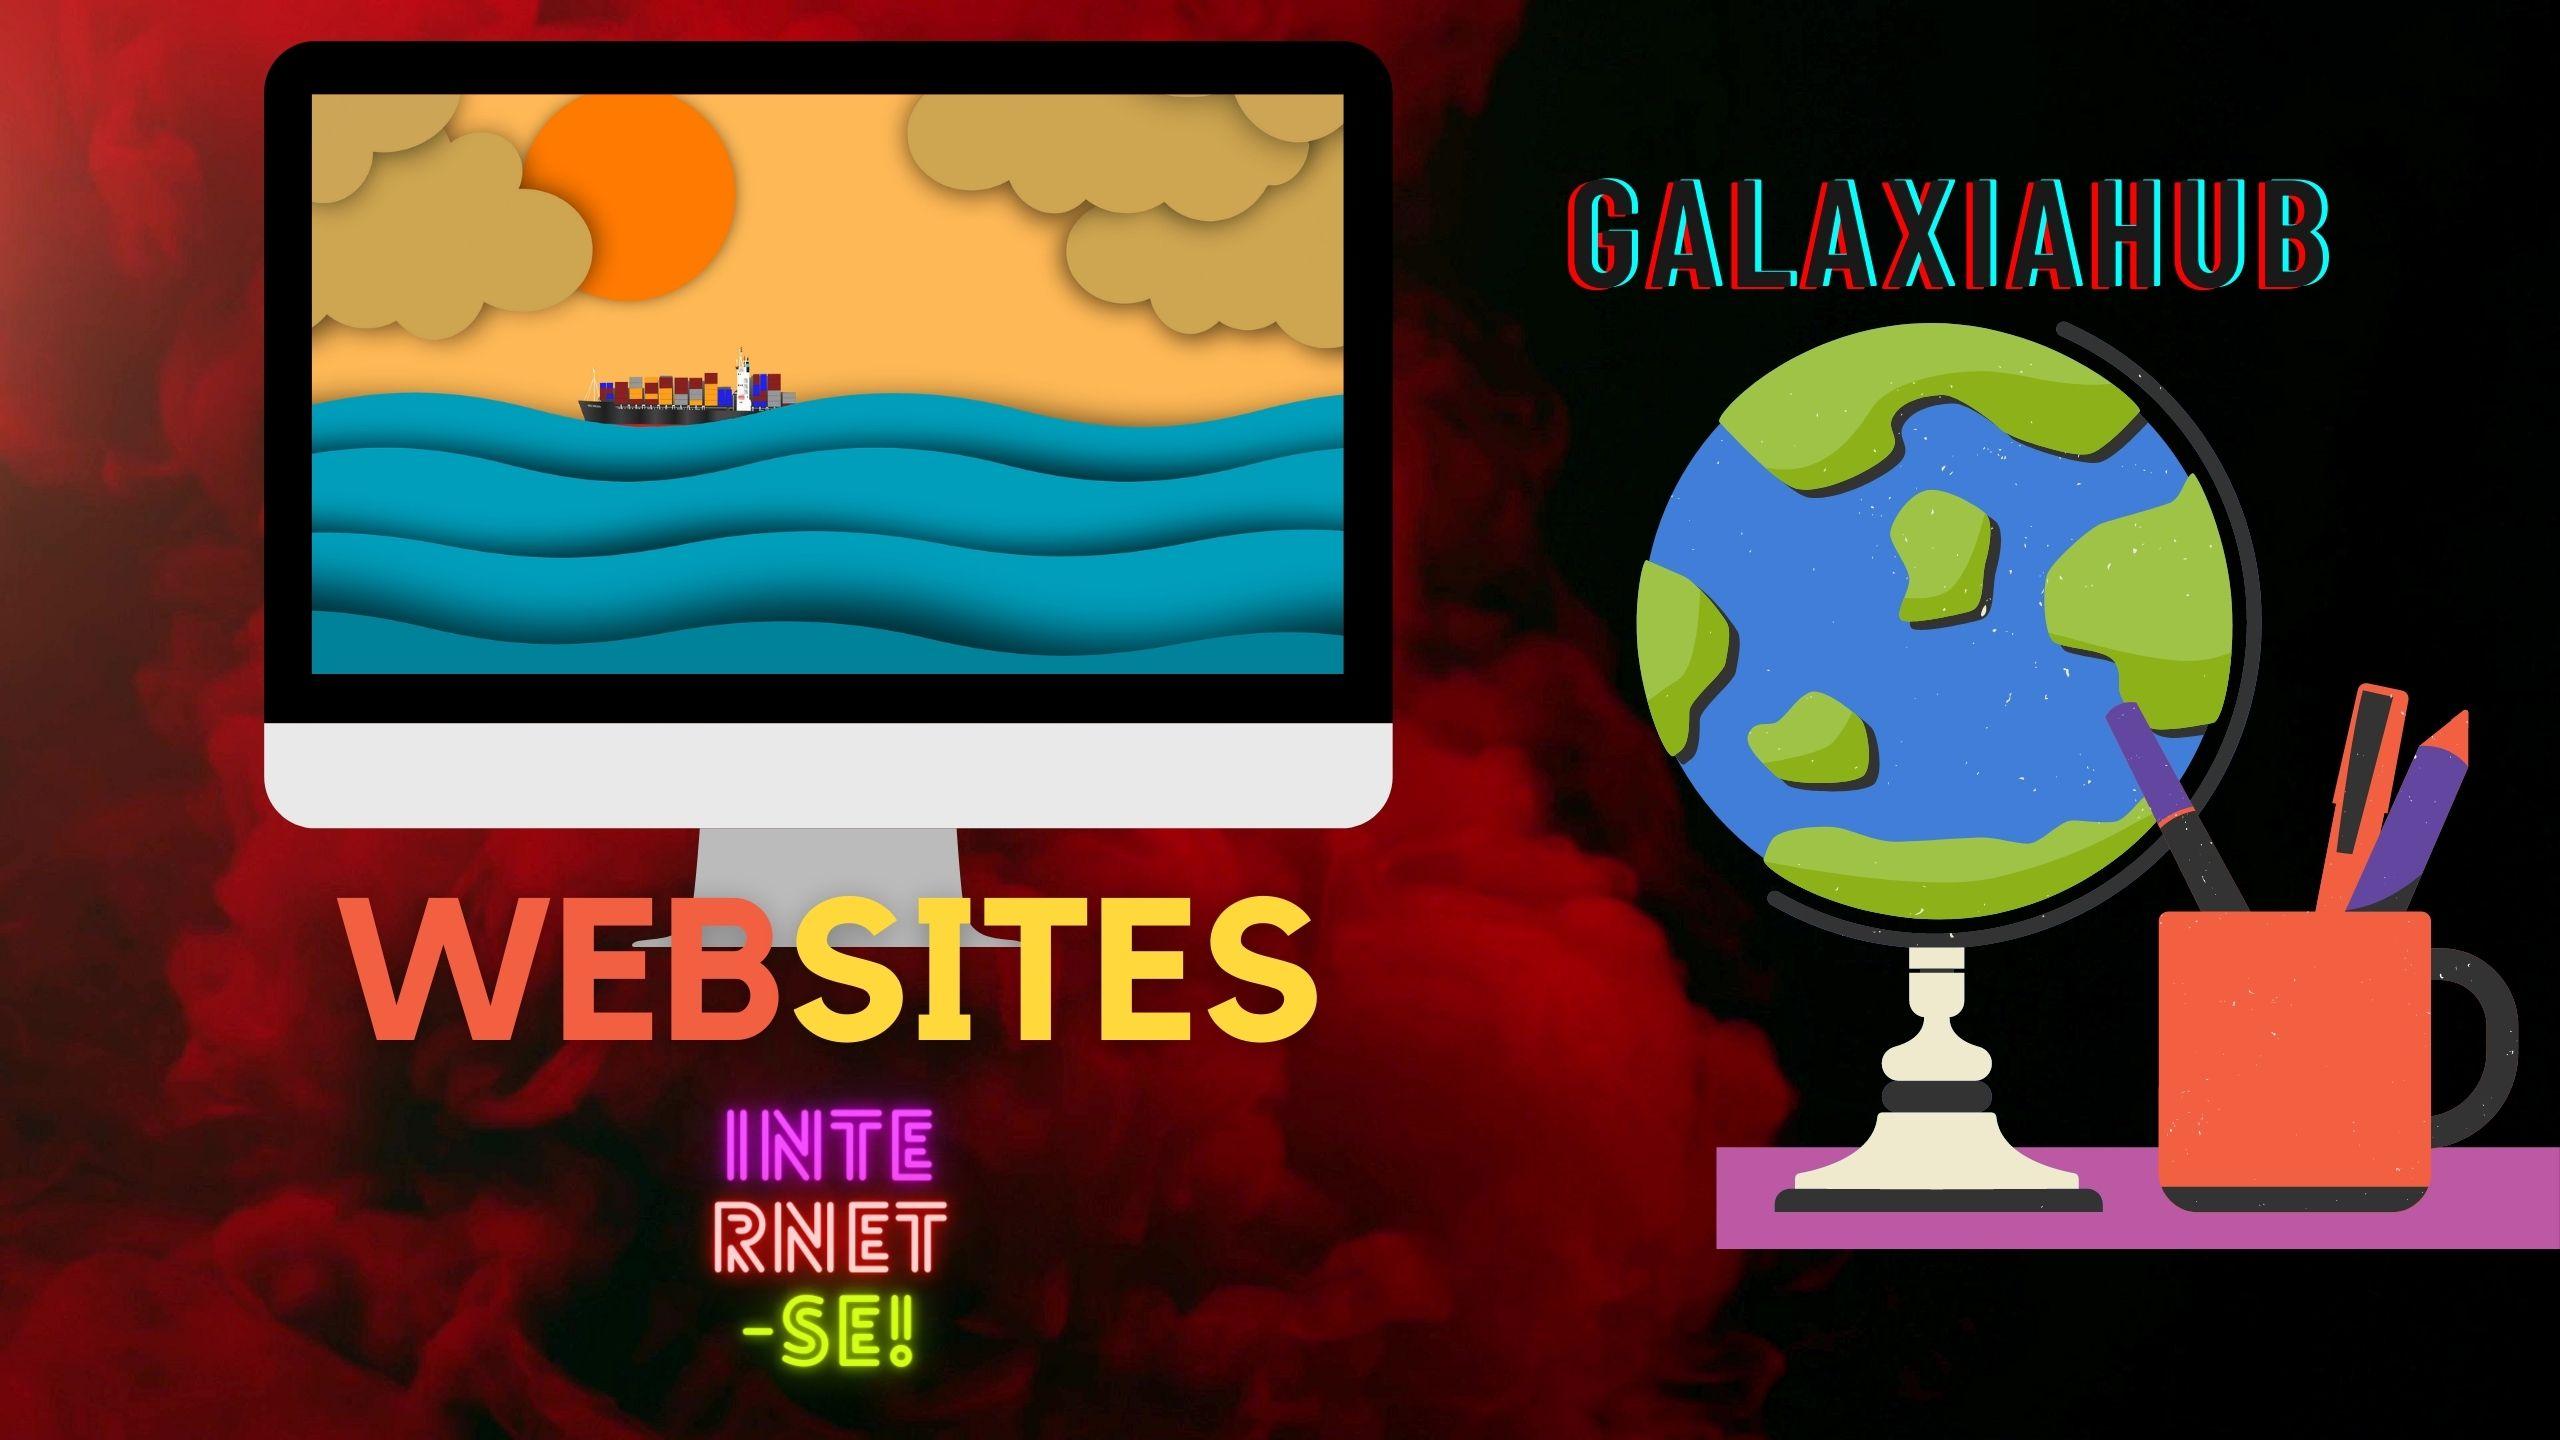 WebSites GalaxiaHub Site